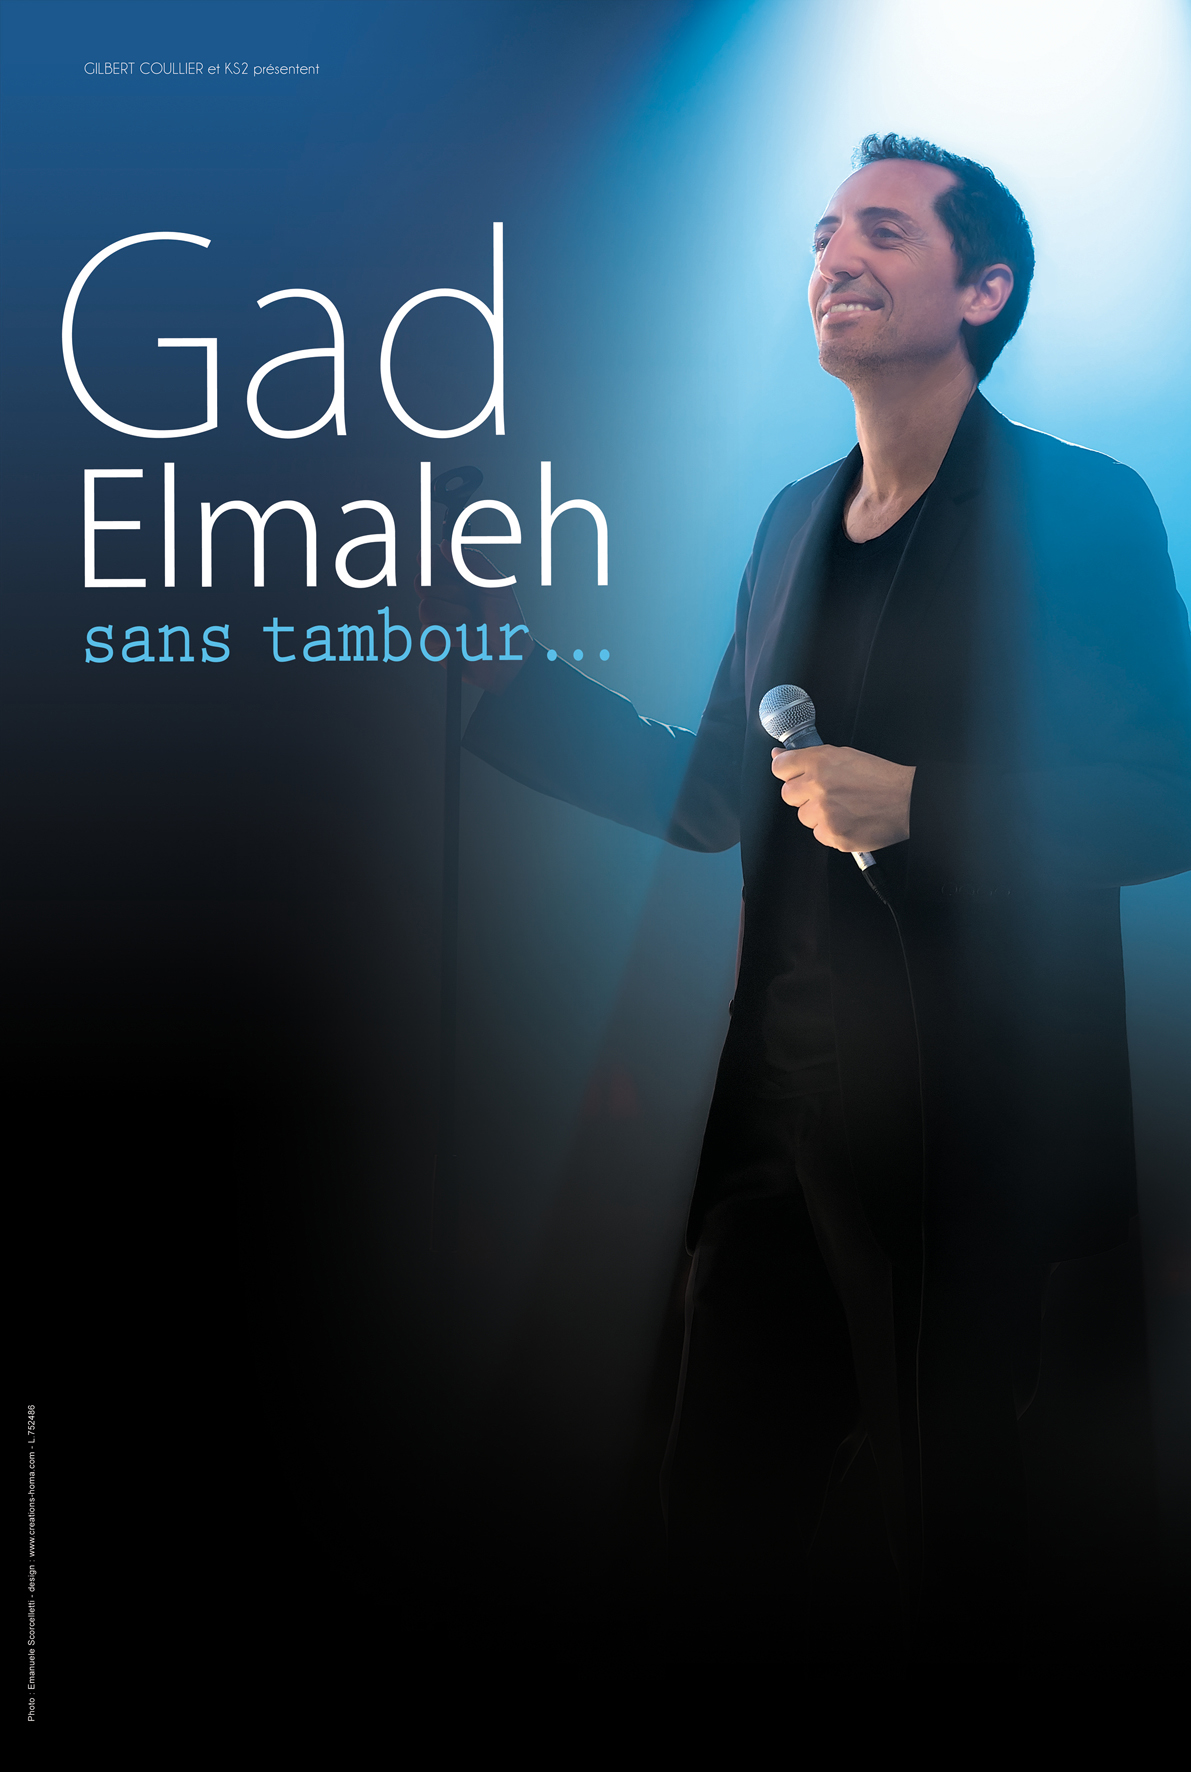 gad elmaleh sans tambour dvd